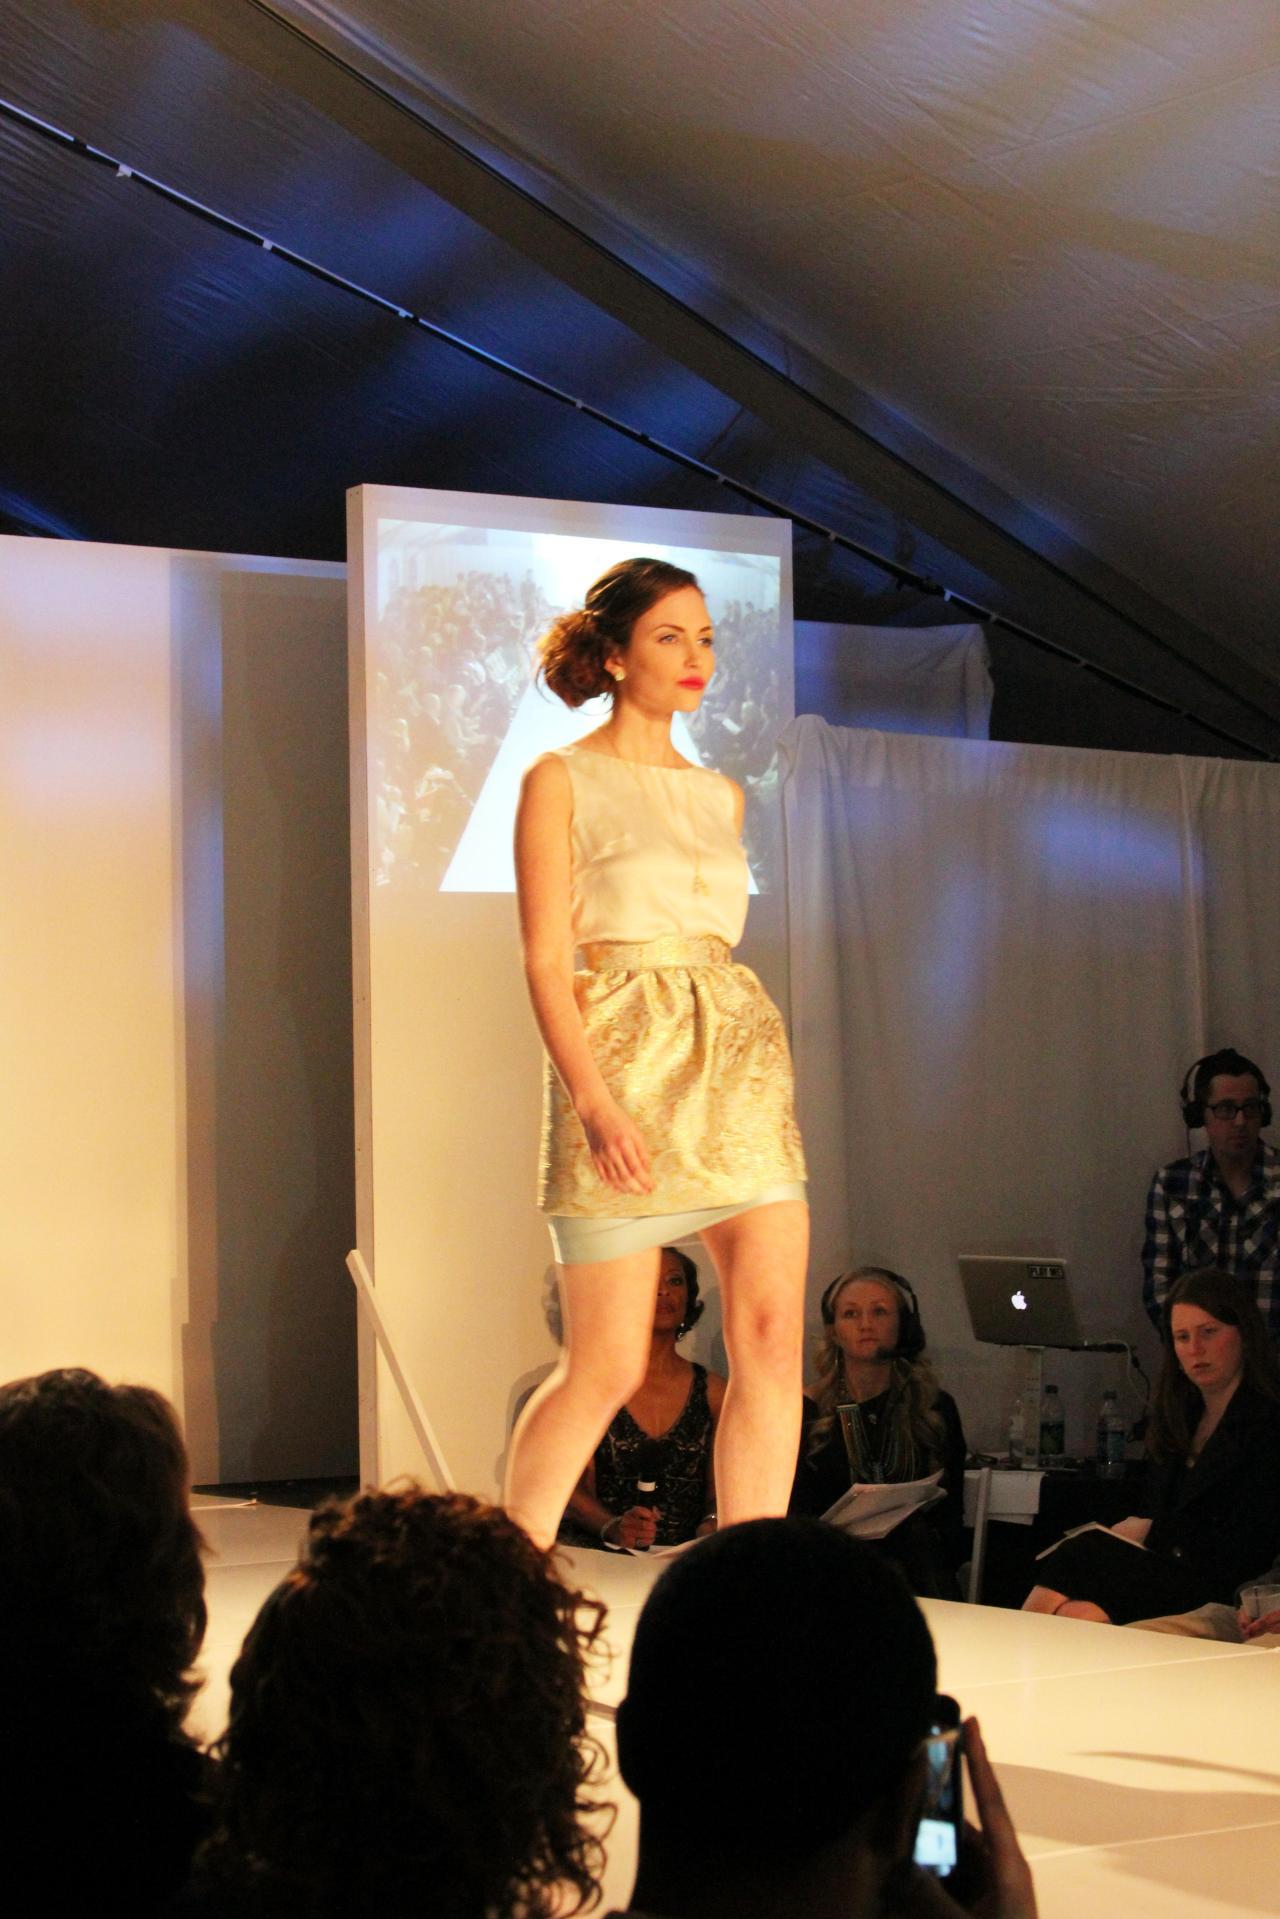 (photo from Birmingham Fashion Week 2012. Photo courtesy of VIP blog)